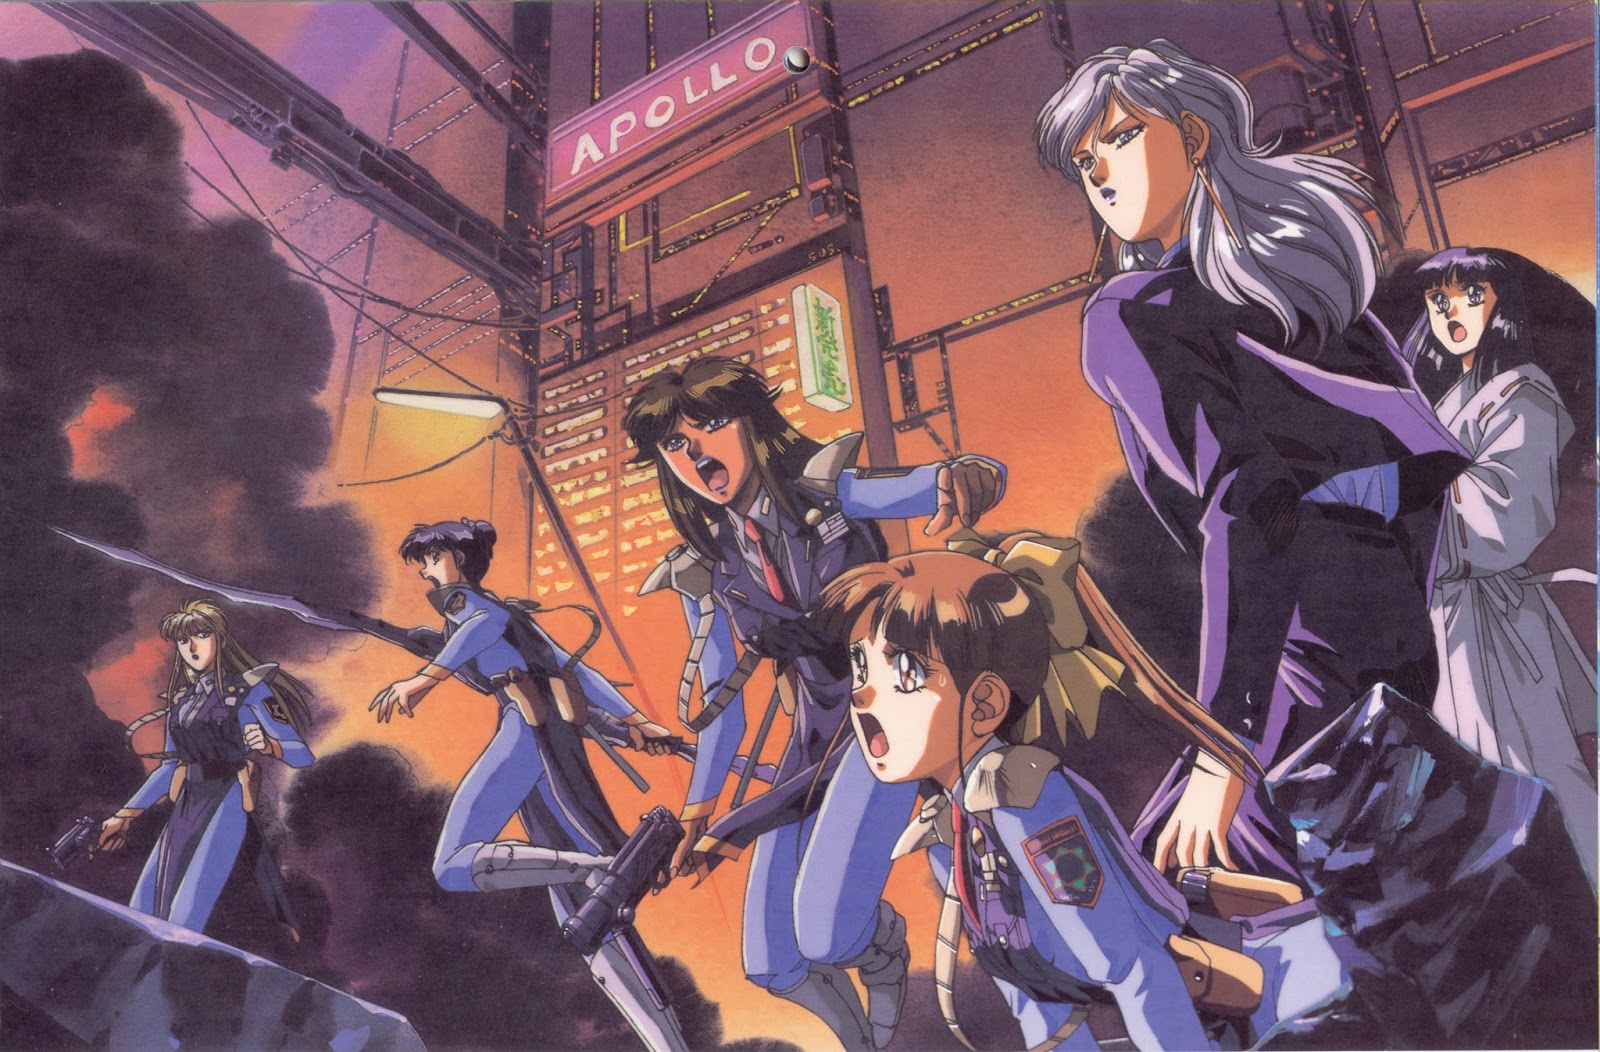 Kết quả hình ảnh cho Silent Mobius: The Motion Picture anime